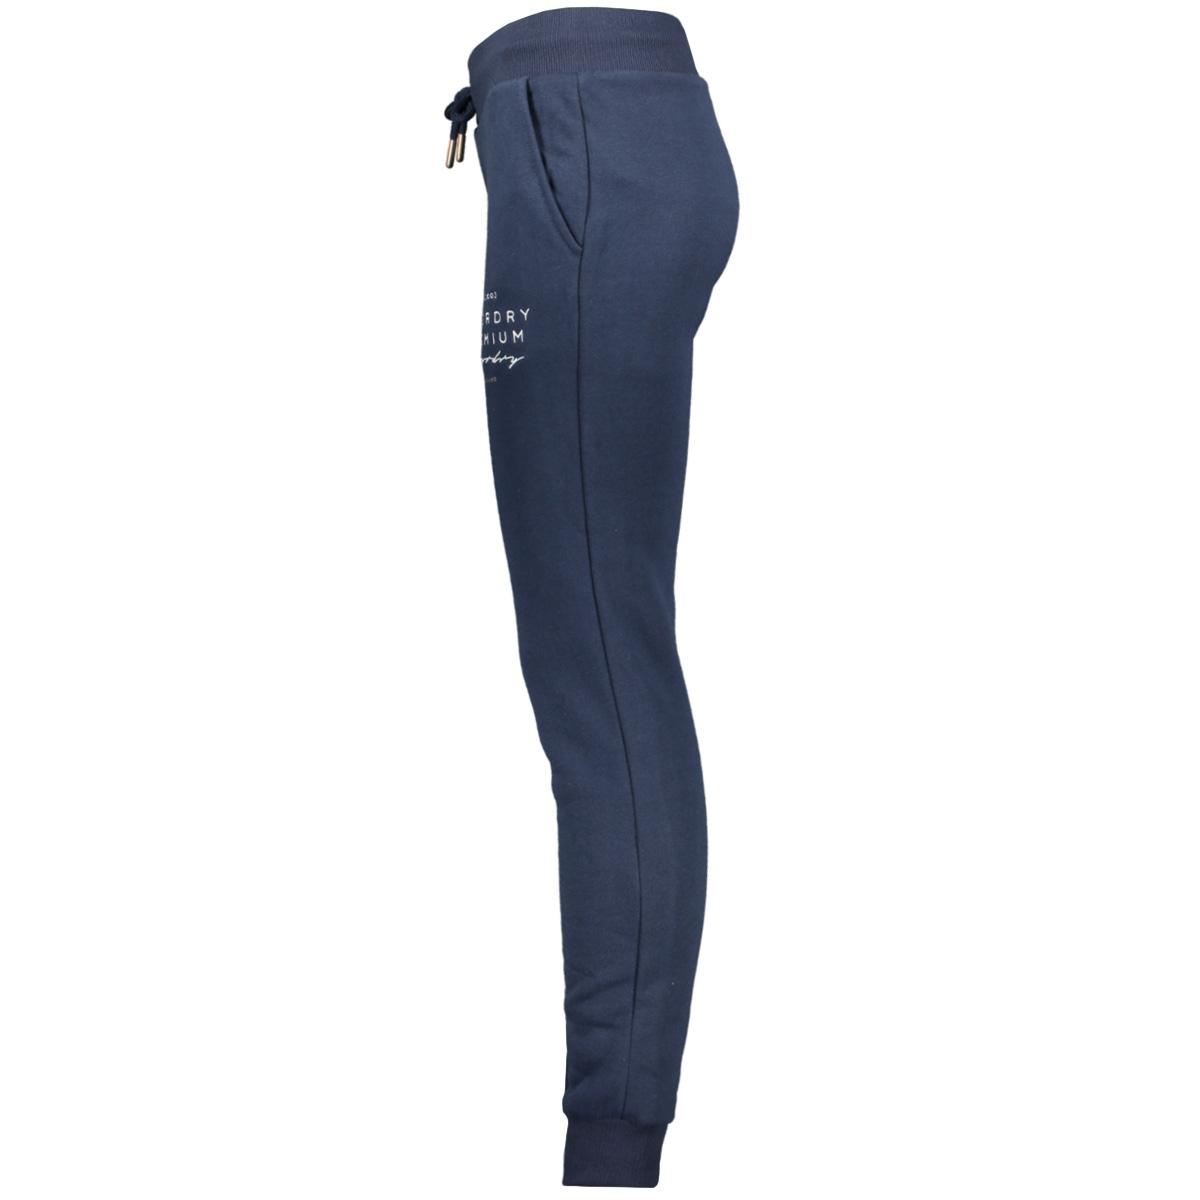 applique joggers w7000005a superdry broek navy